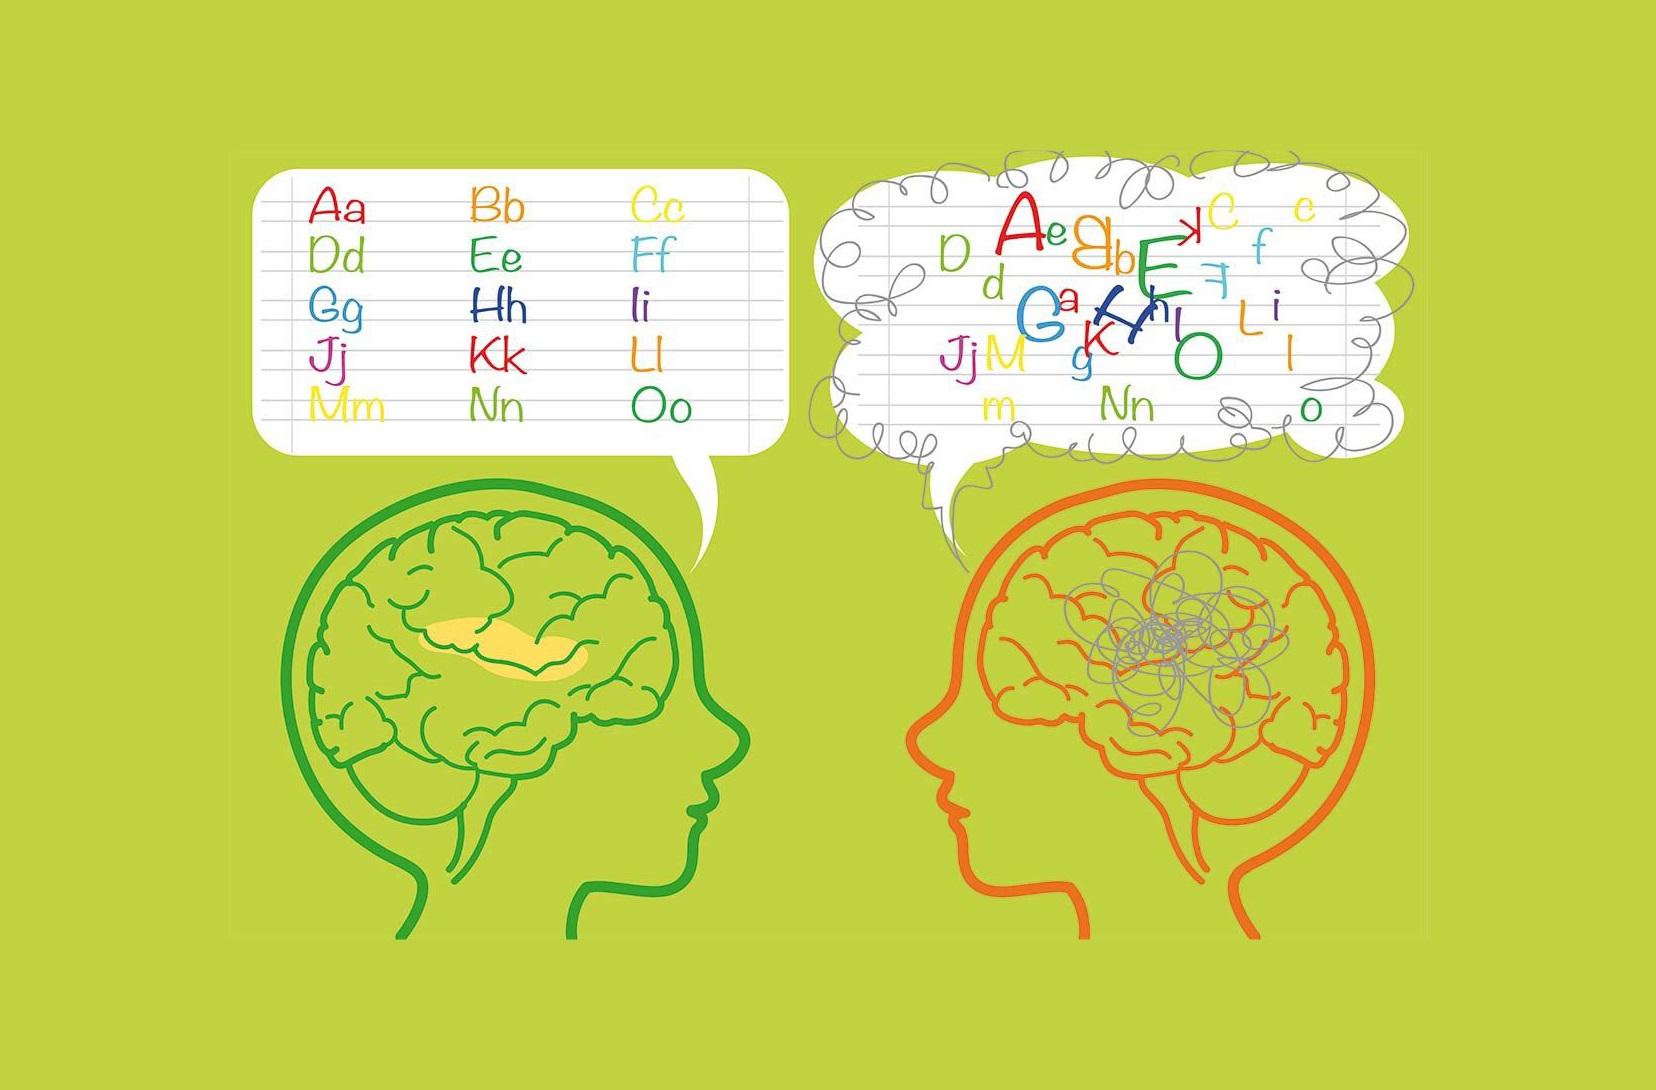 дислексии